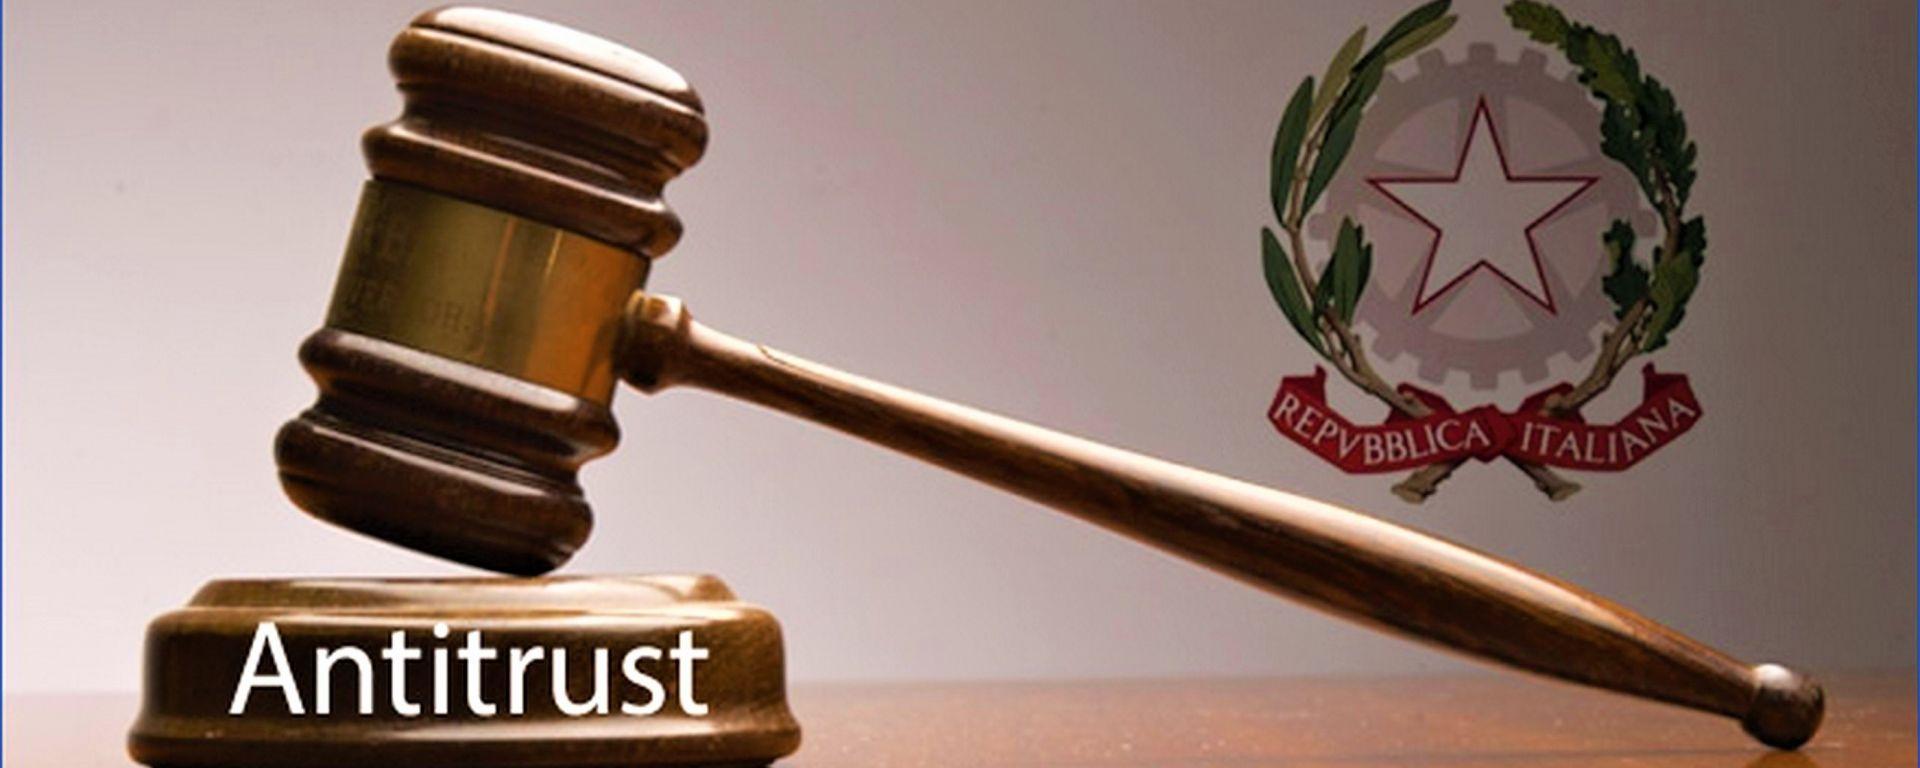 Antitrust case auto